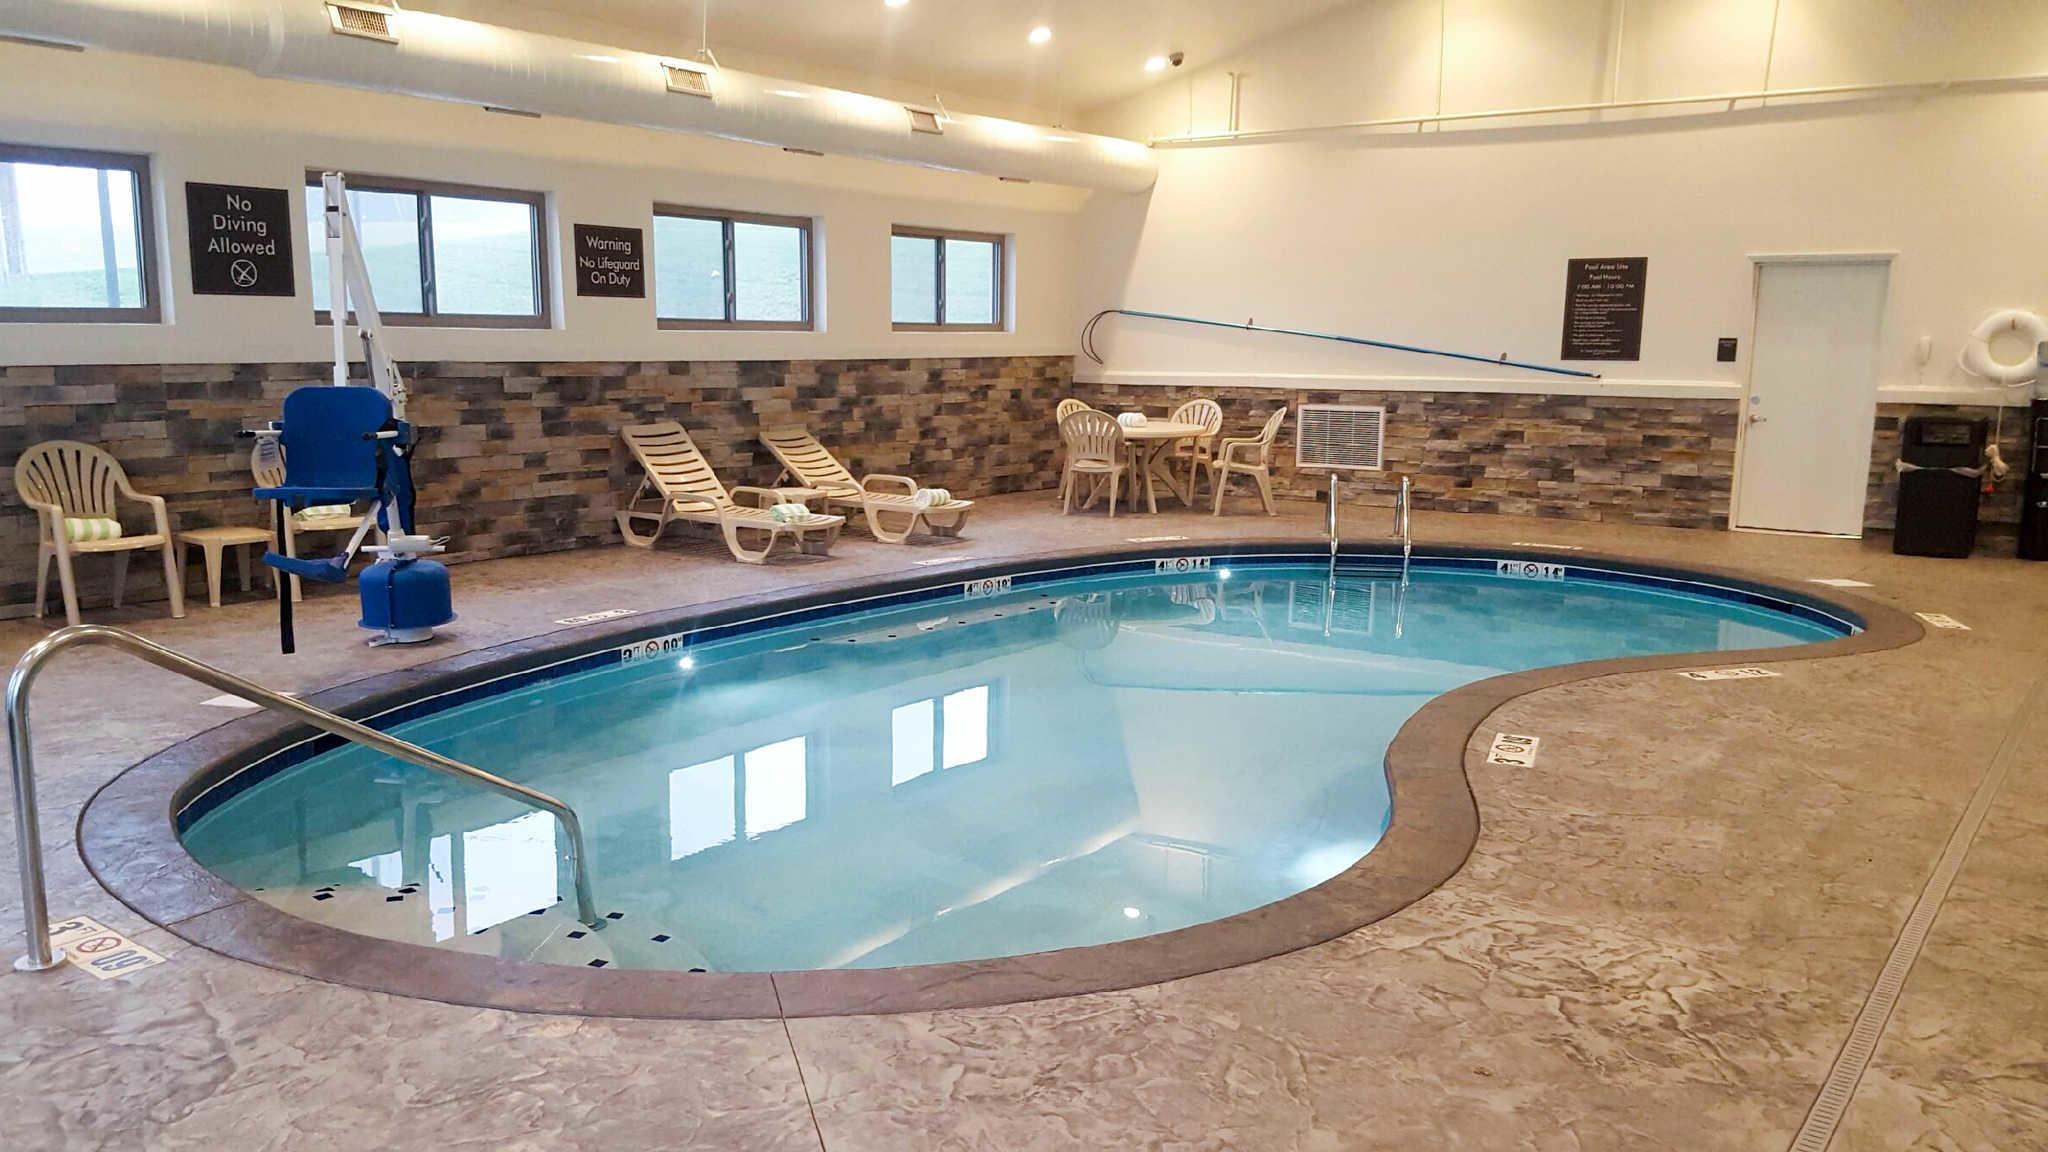 Sleep Inn & Suites Belmont / St. Clairsville image 8